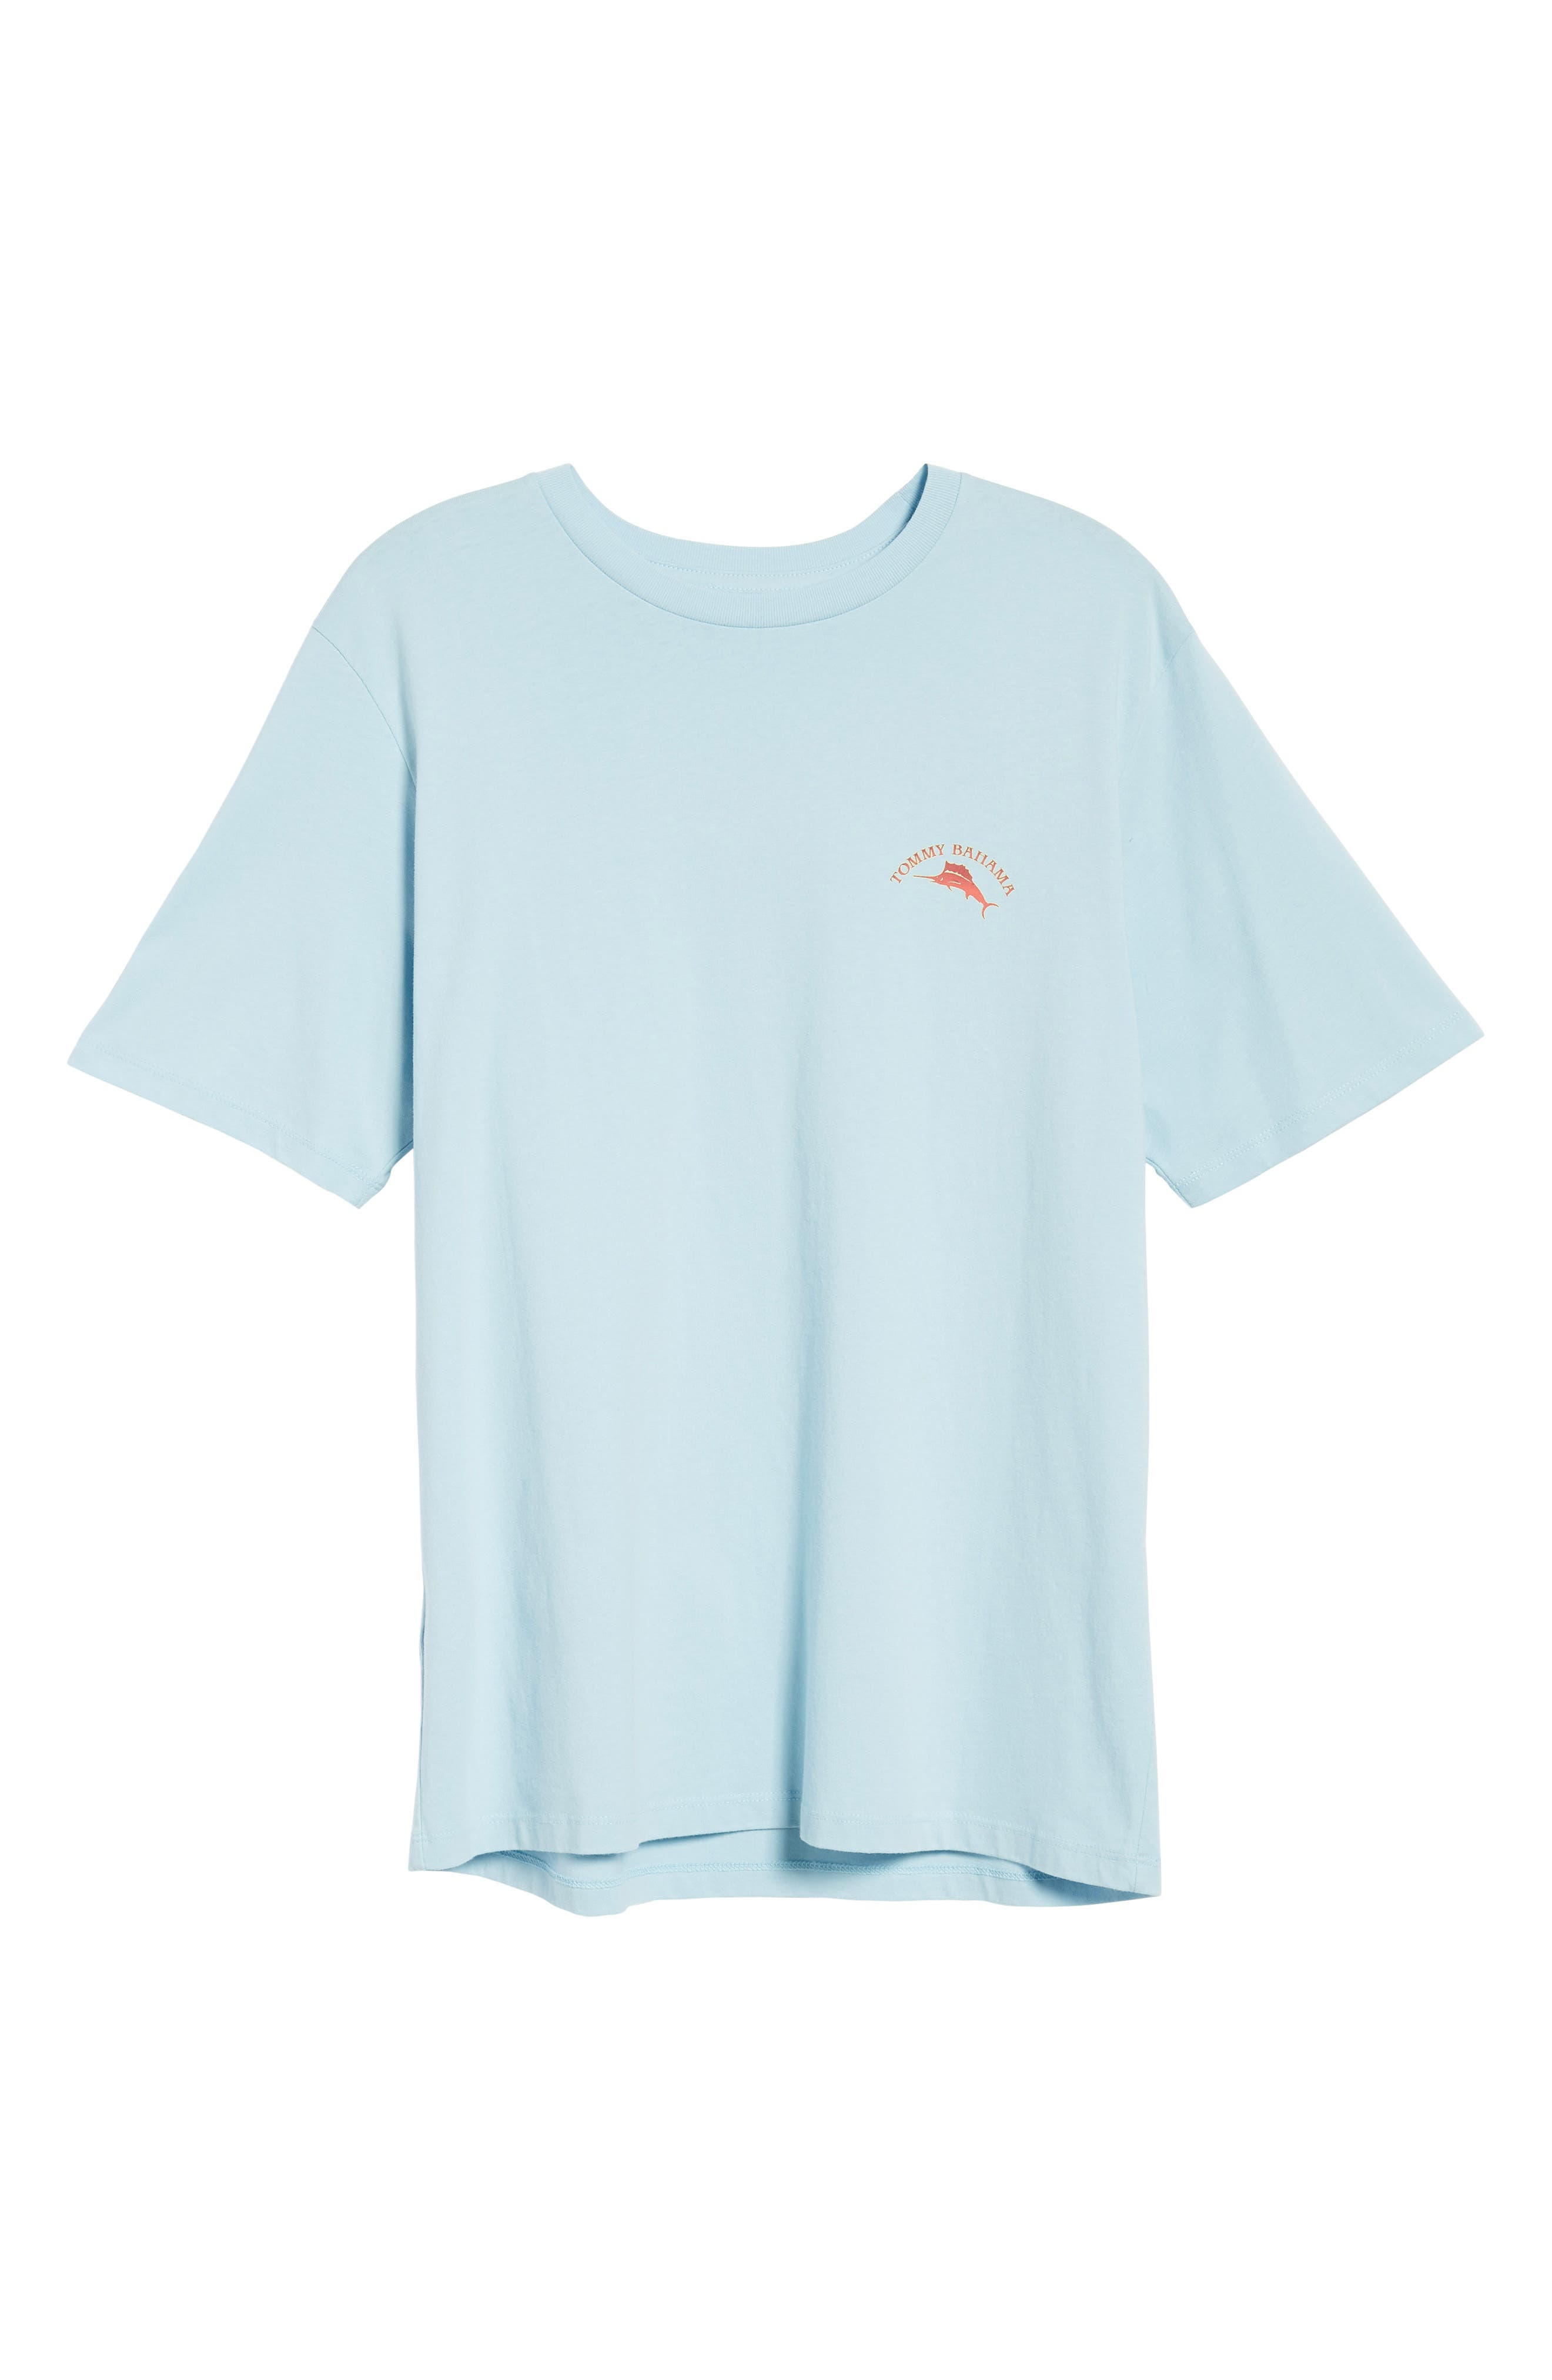 Zinspiration T-Shirt,                             Alternate thumbnail 6, color,                             100